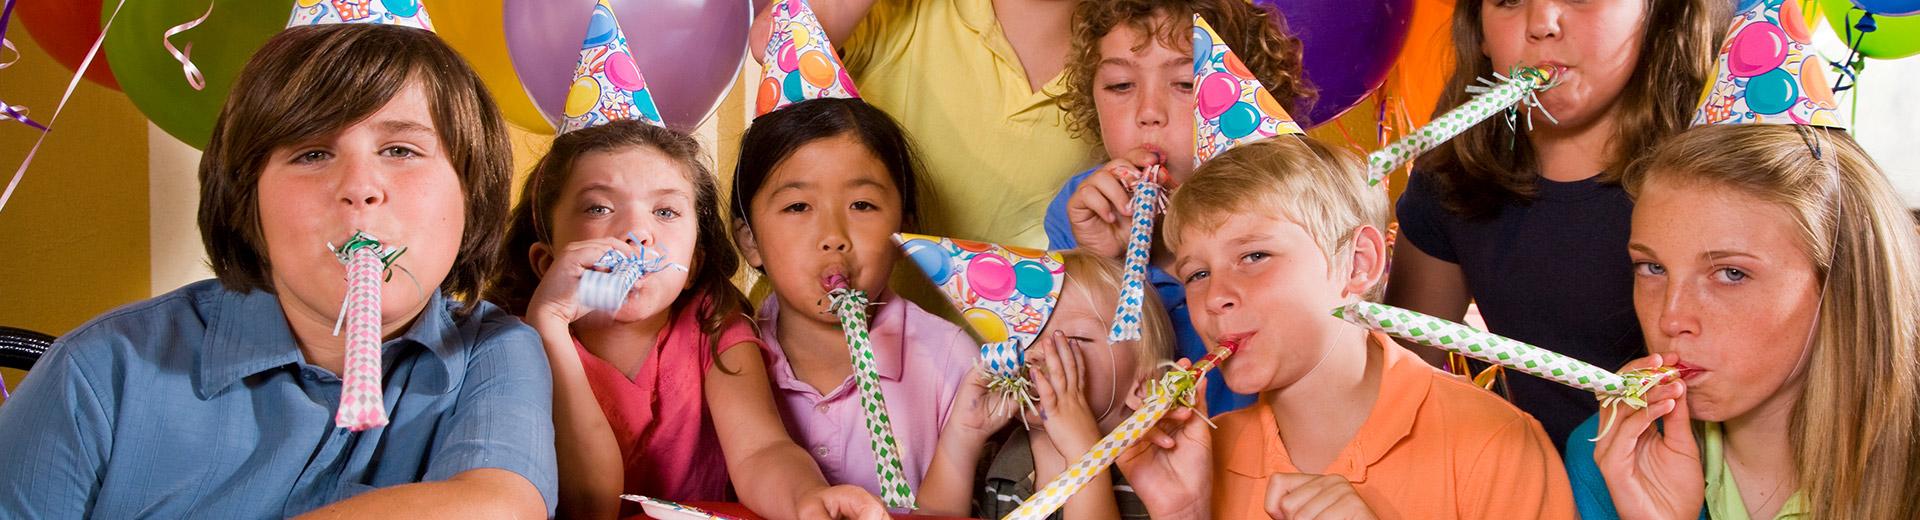 Birthday Parties   Adventure Landing Family Entertainment Center   Winston-Salem, NC